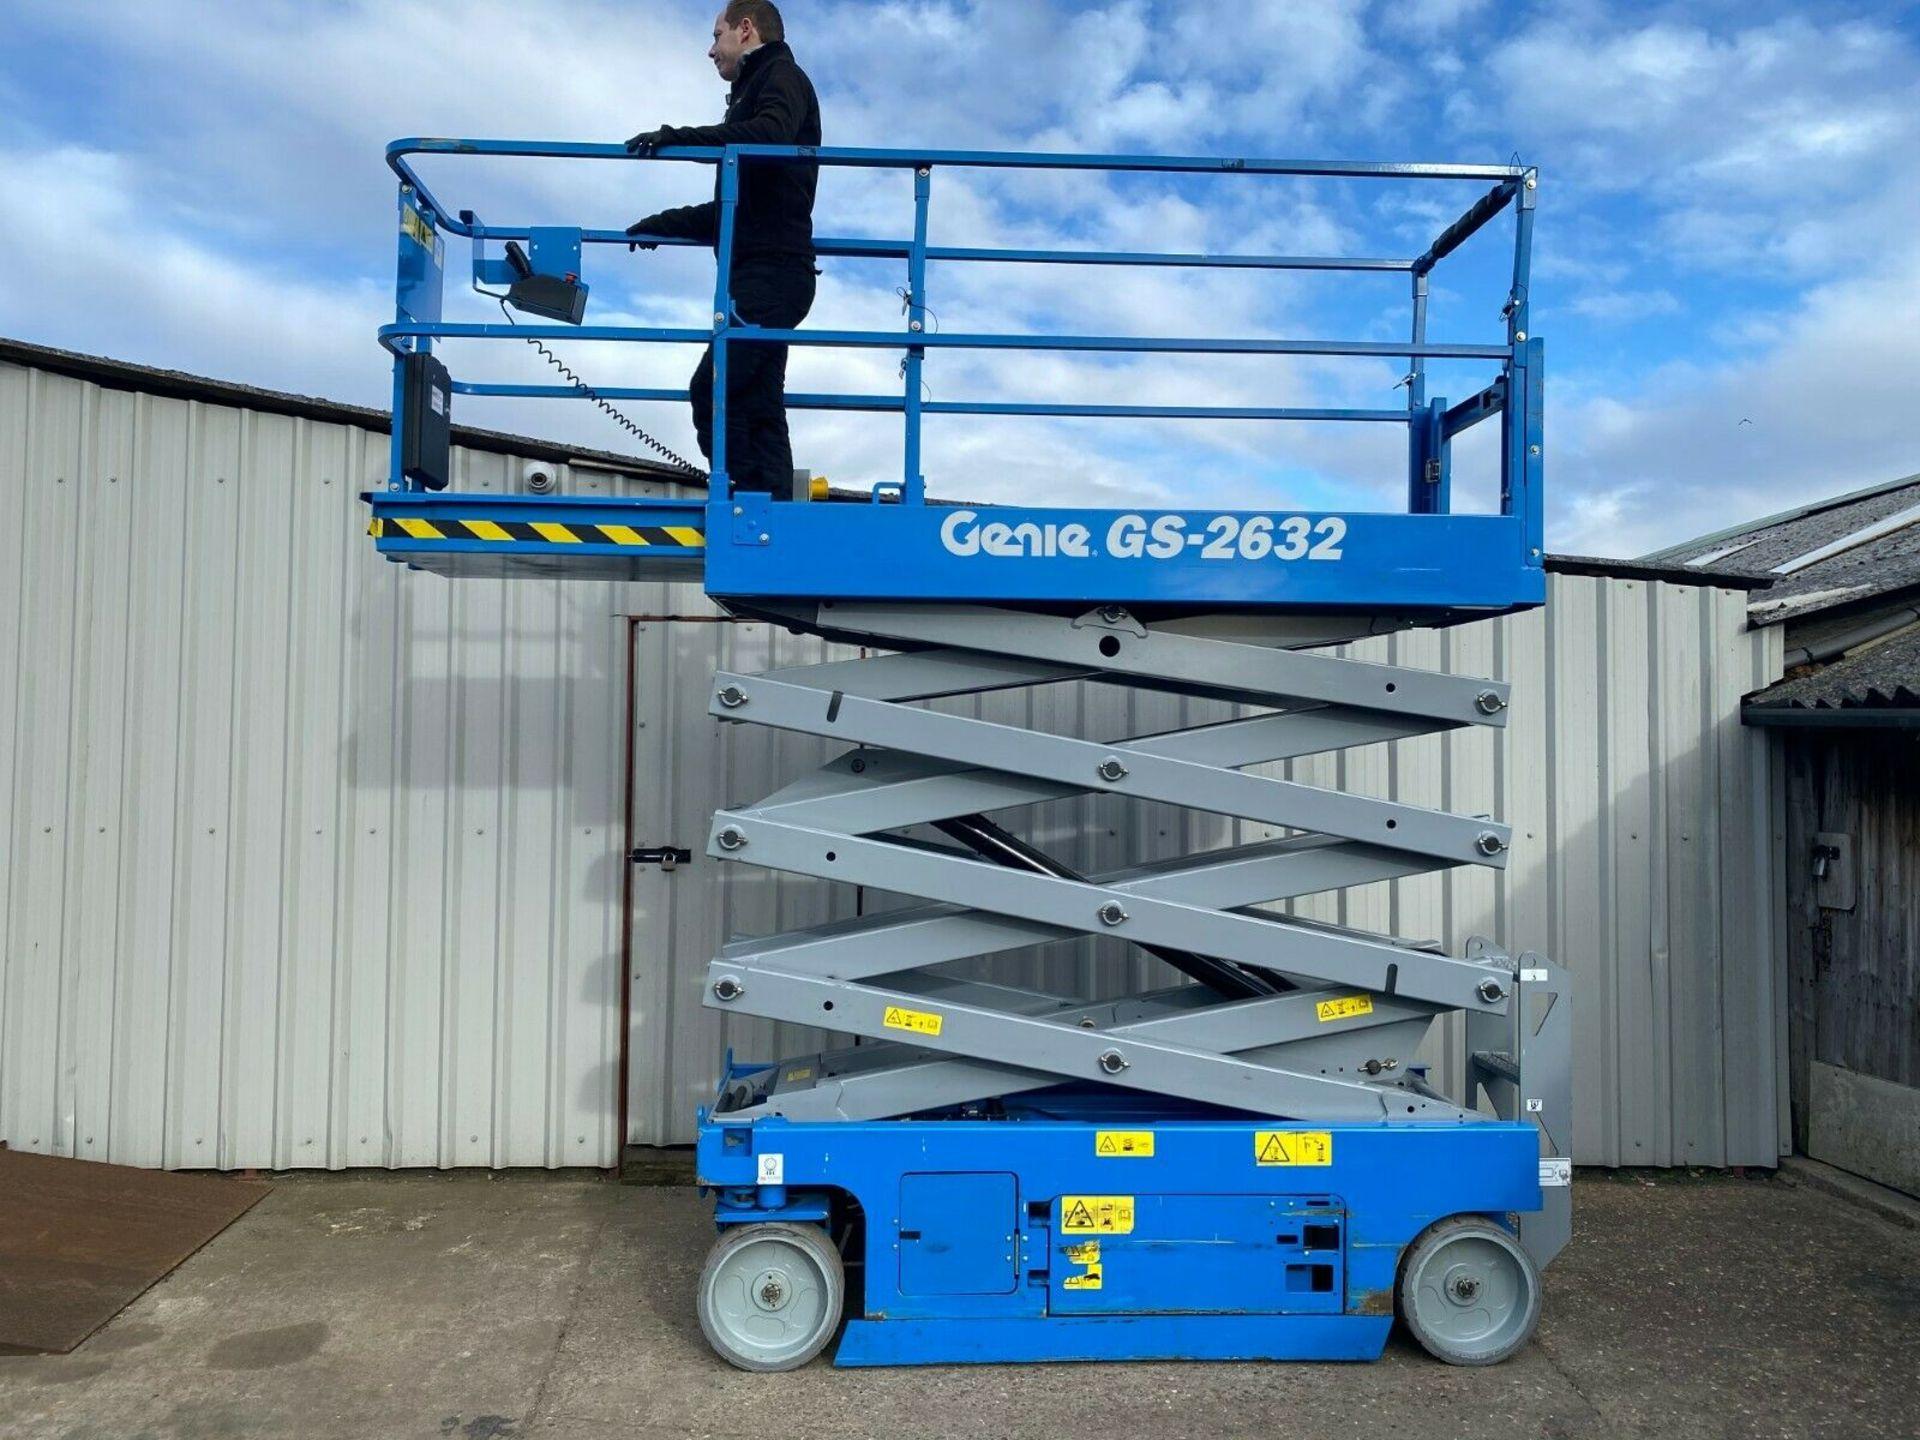 Lot 164 - GENIE GS-2632 ACCESS PLATFORM SCISSOR LIFT, YEAR 2014 *PLUS VAT*